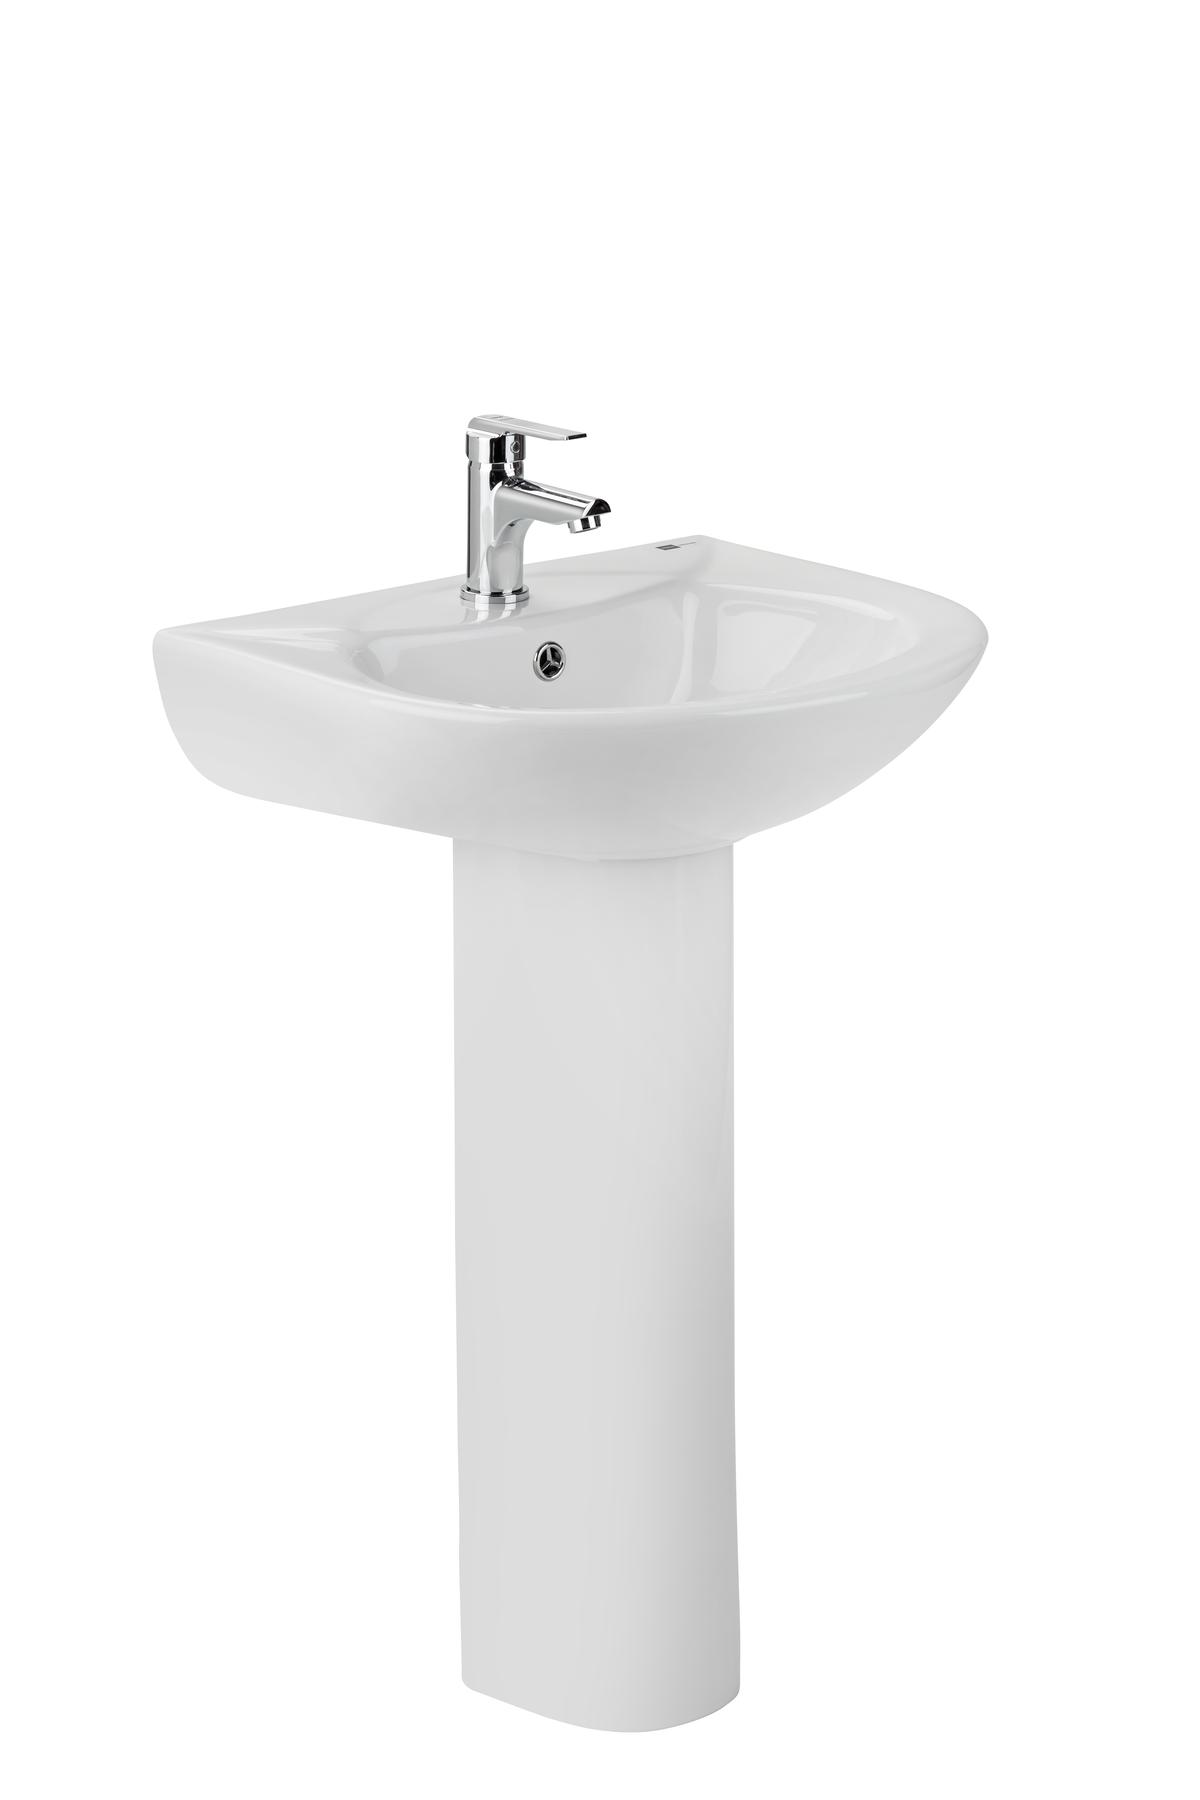 Basin 52cm